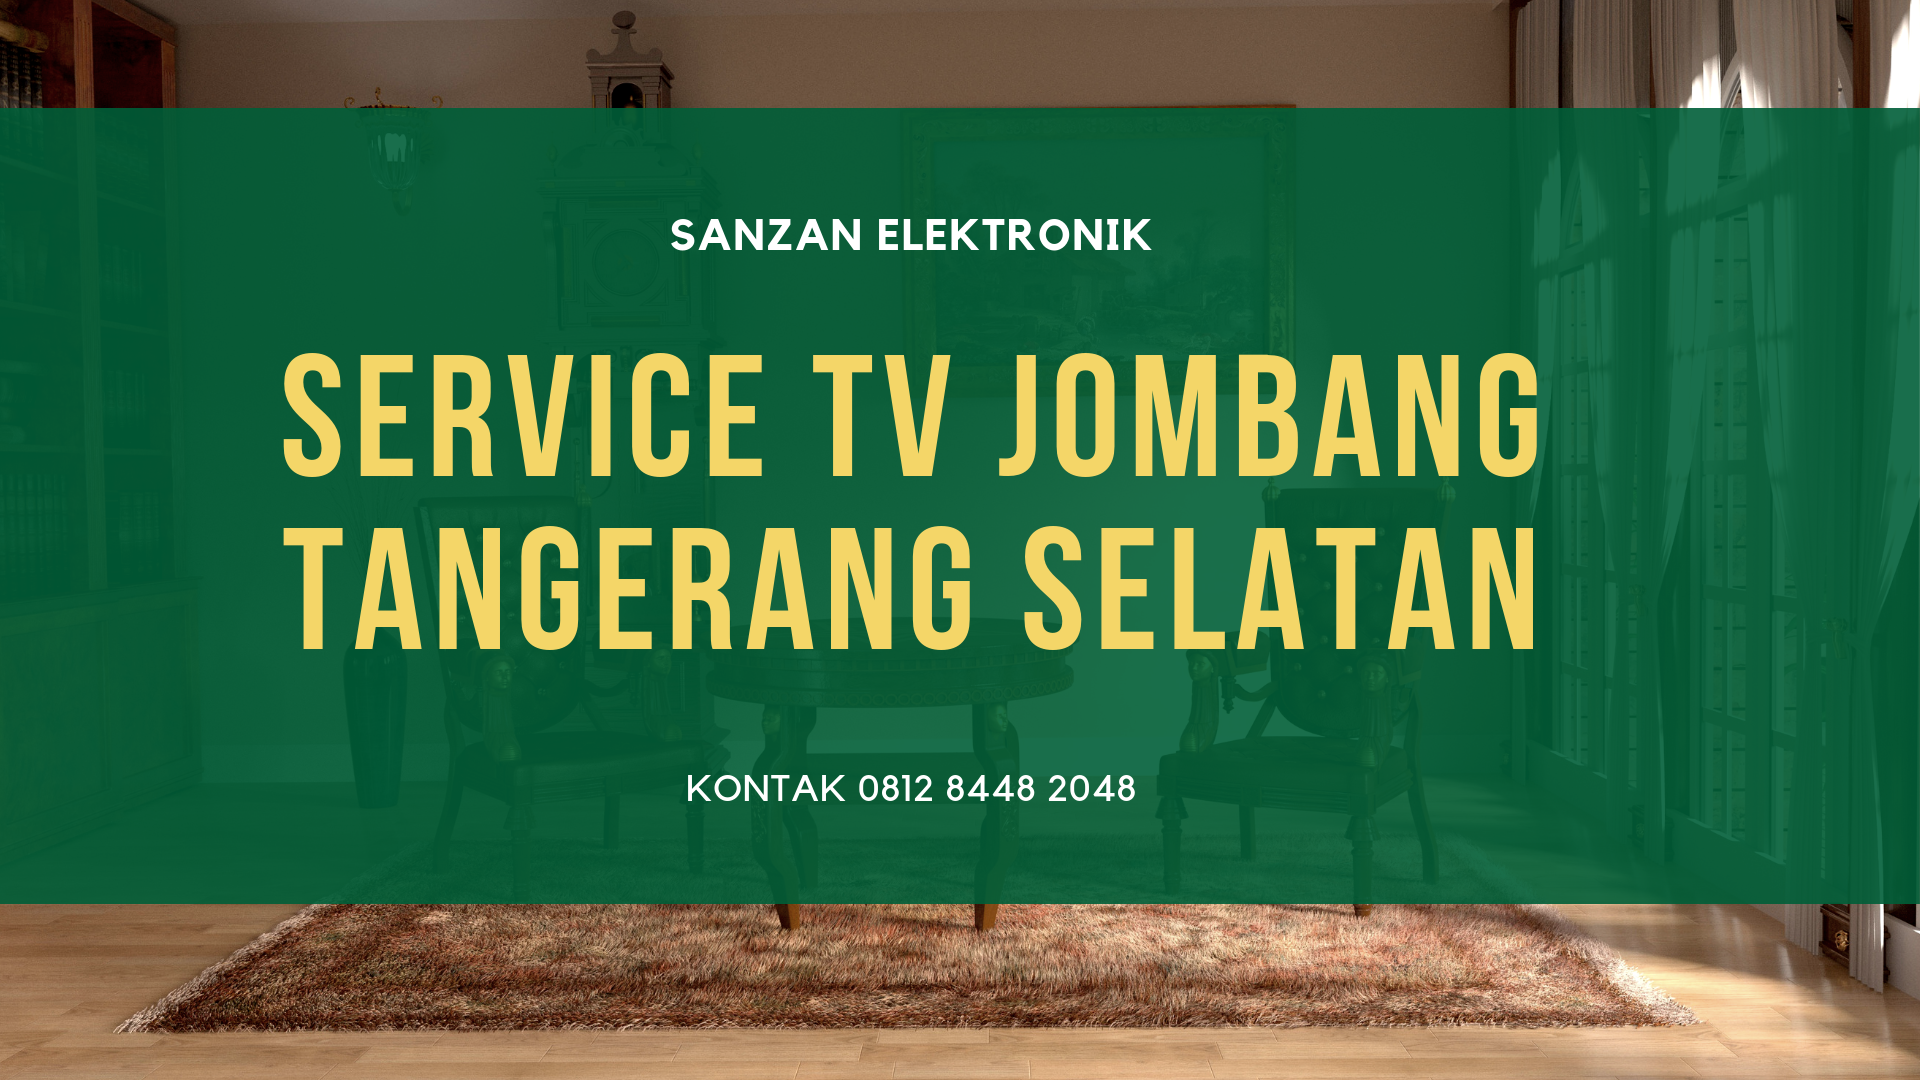 Service TV Jombang Tangerang Selatan